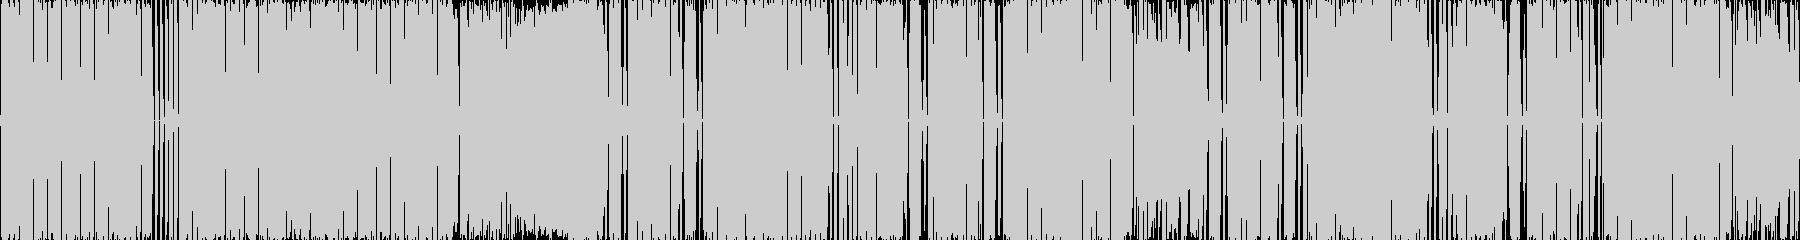 【FMシンセ/ロック/ダブステップ】の未再生の波形